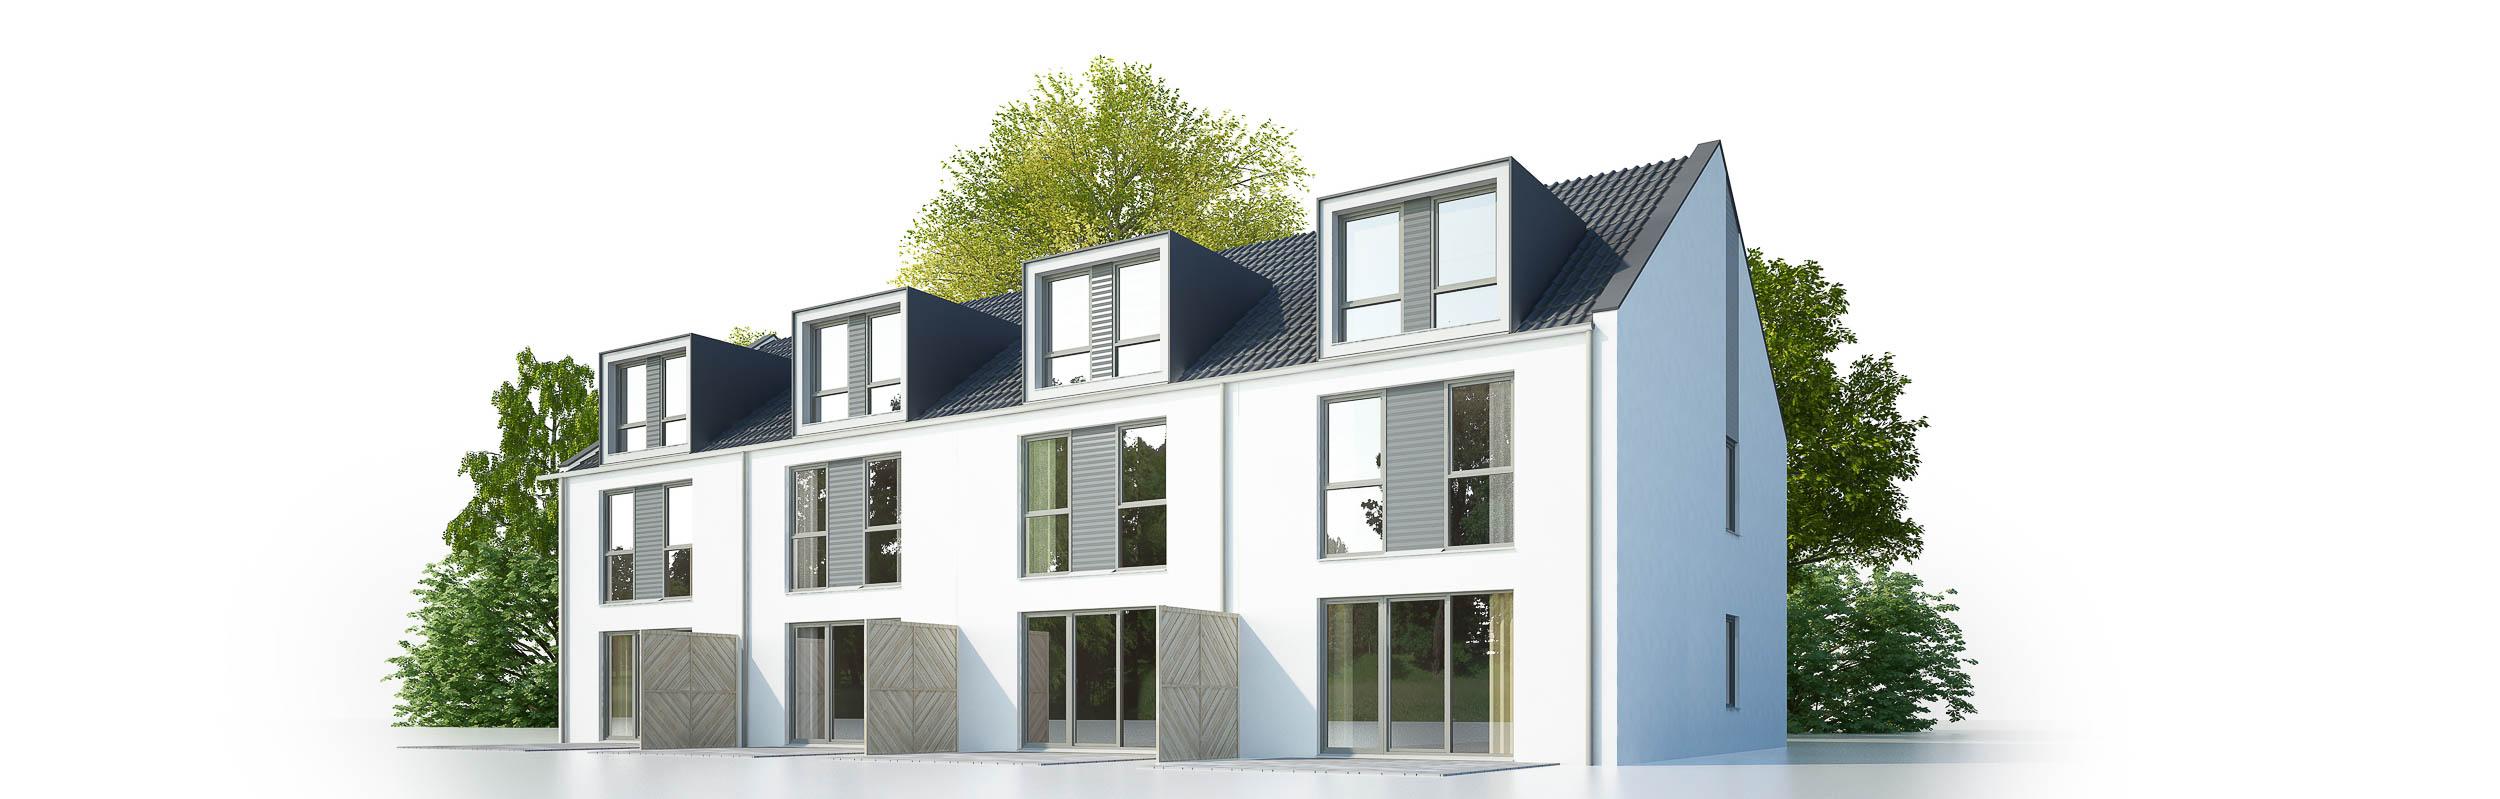 Immobilien Mehrfamilienhaus